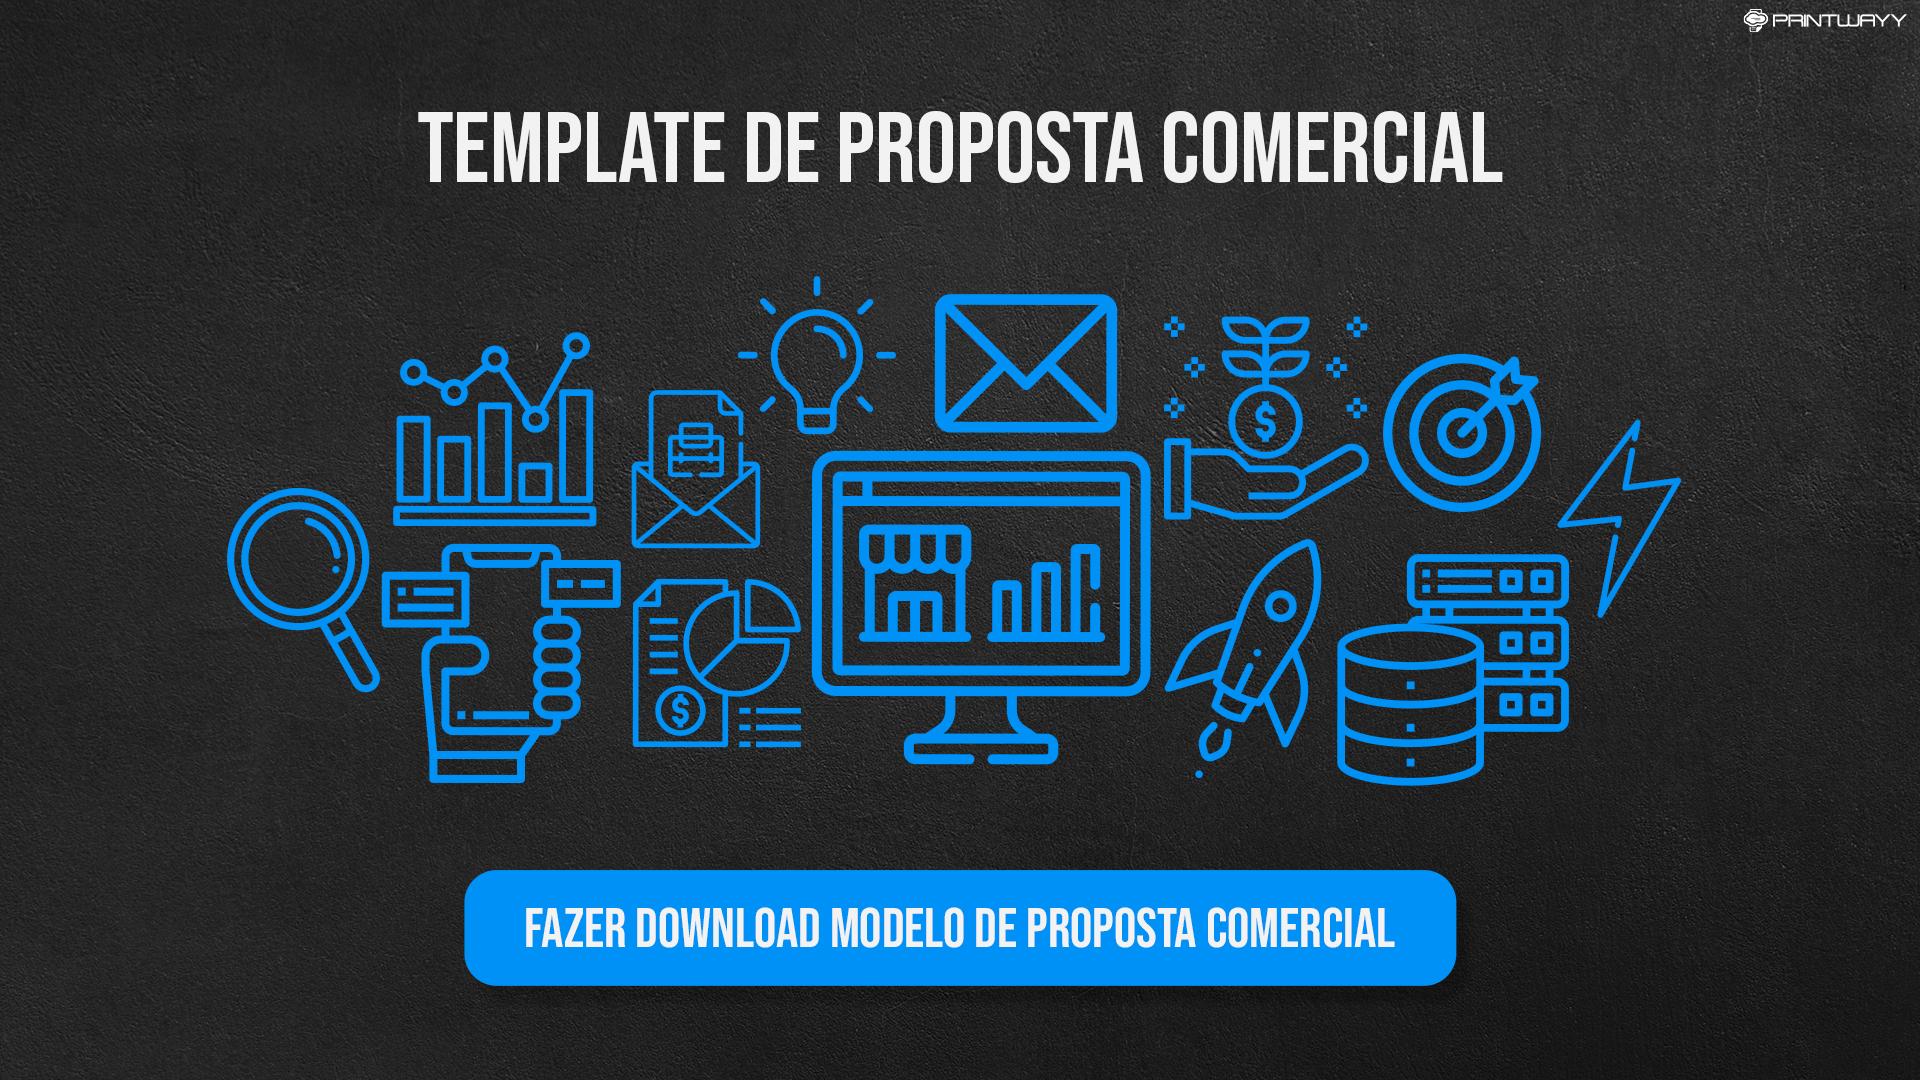 Convite para realizar o download do Tamplate de Proposta Comercial, material elaborado pela PrintWayy.